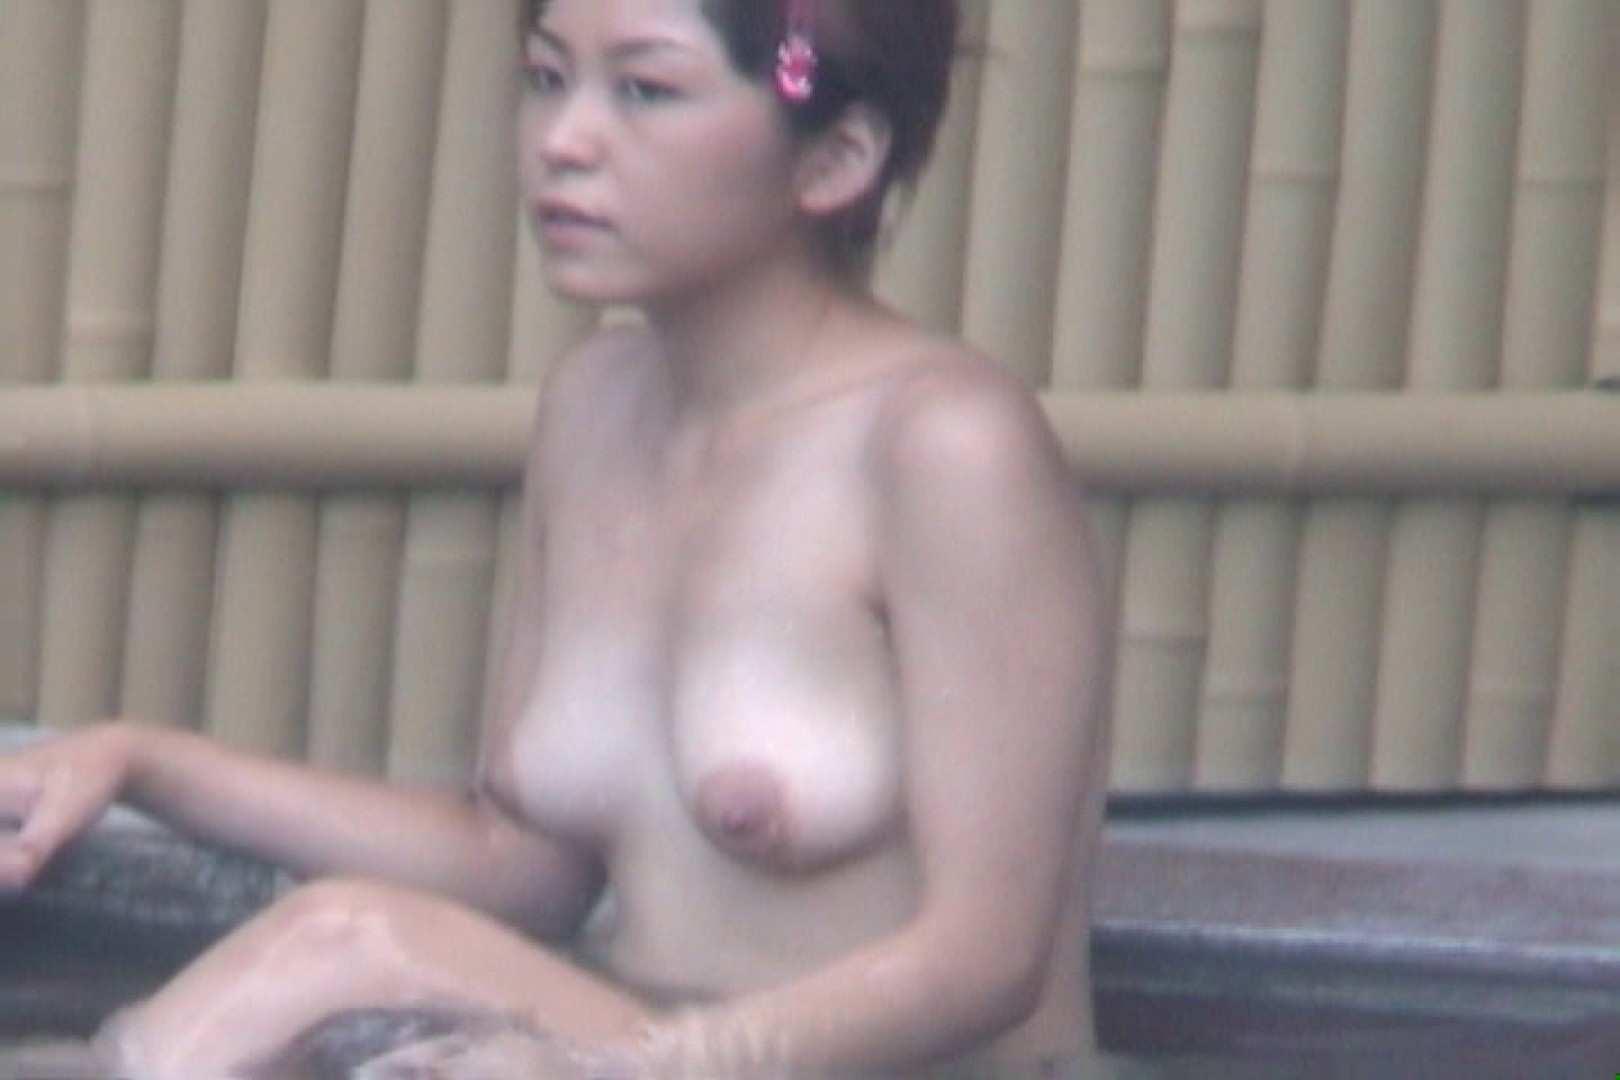 Aquaな露天風呂Vol.574 盗撮 | OLセックス  97画像 55